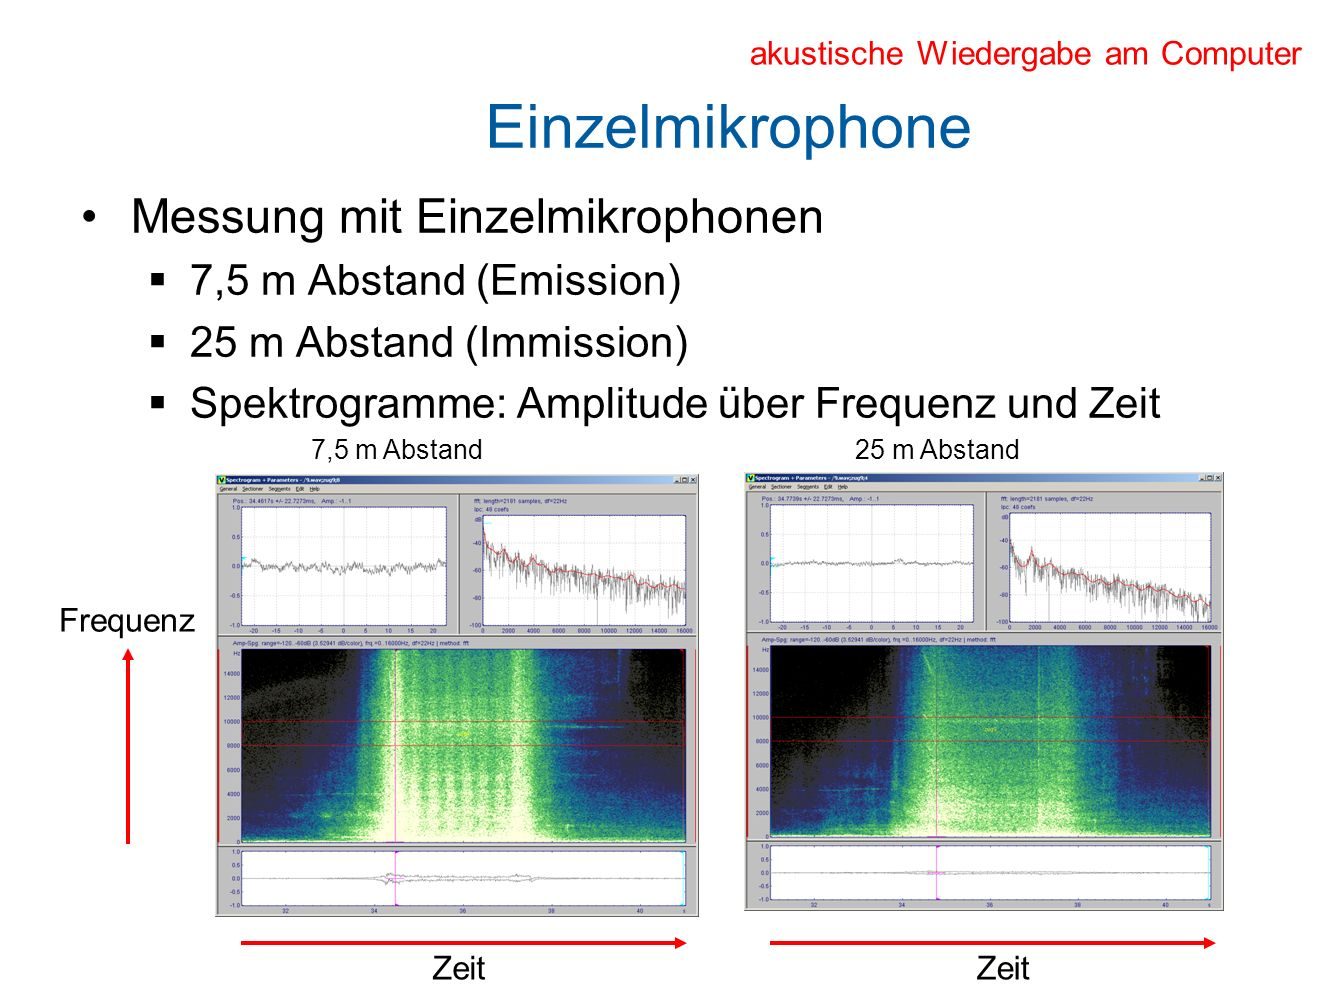 Mikrophon-Array Zeitlicher Beamformer Fokus horizontal: Senkrecht zum Array Fokus vertikal in 4 Höhen: Fahrdraht (oberer Teil des Stromabnehmers) Triebfahrzeugdach Fensterhöhe Rad-Schiene-Kontakt